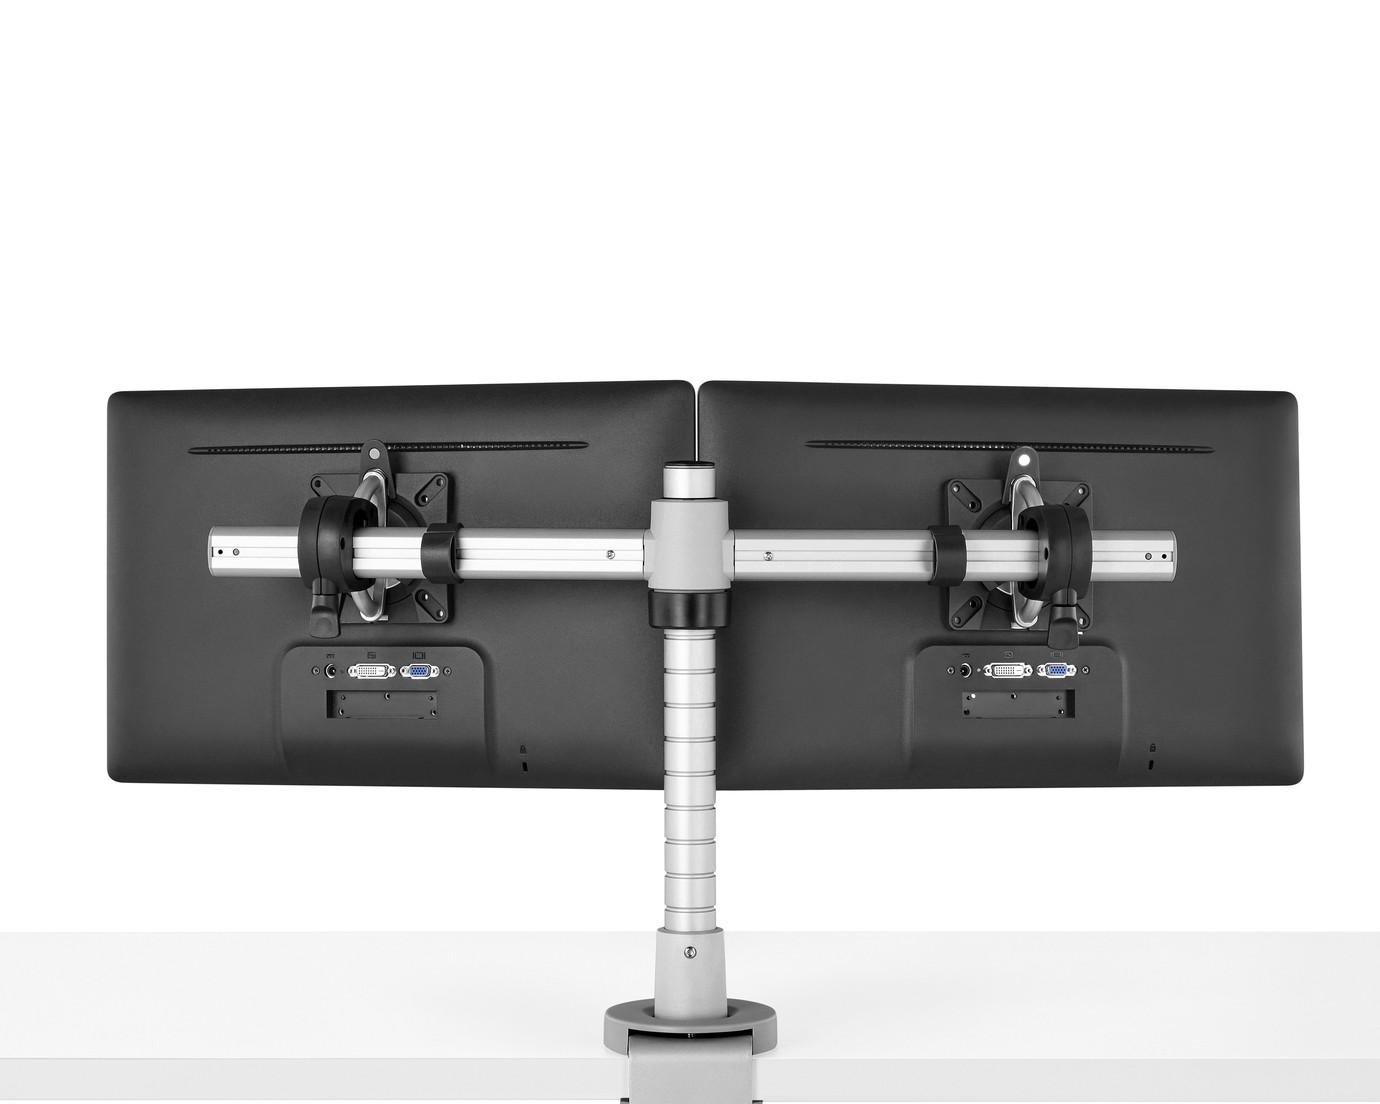 2-Equipamiento-Soporte-Monitor-Wishbone-1-1380